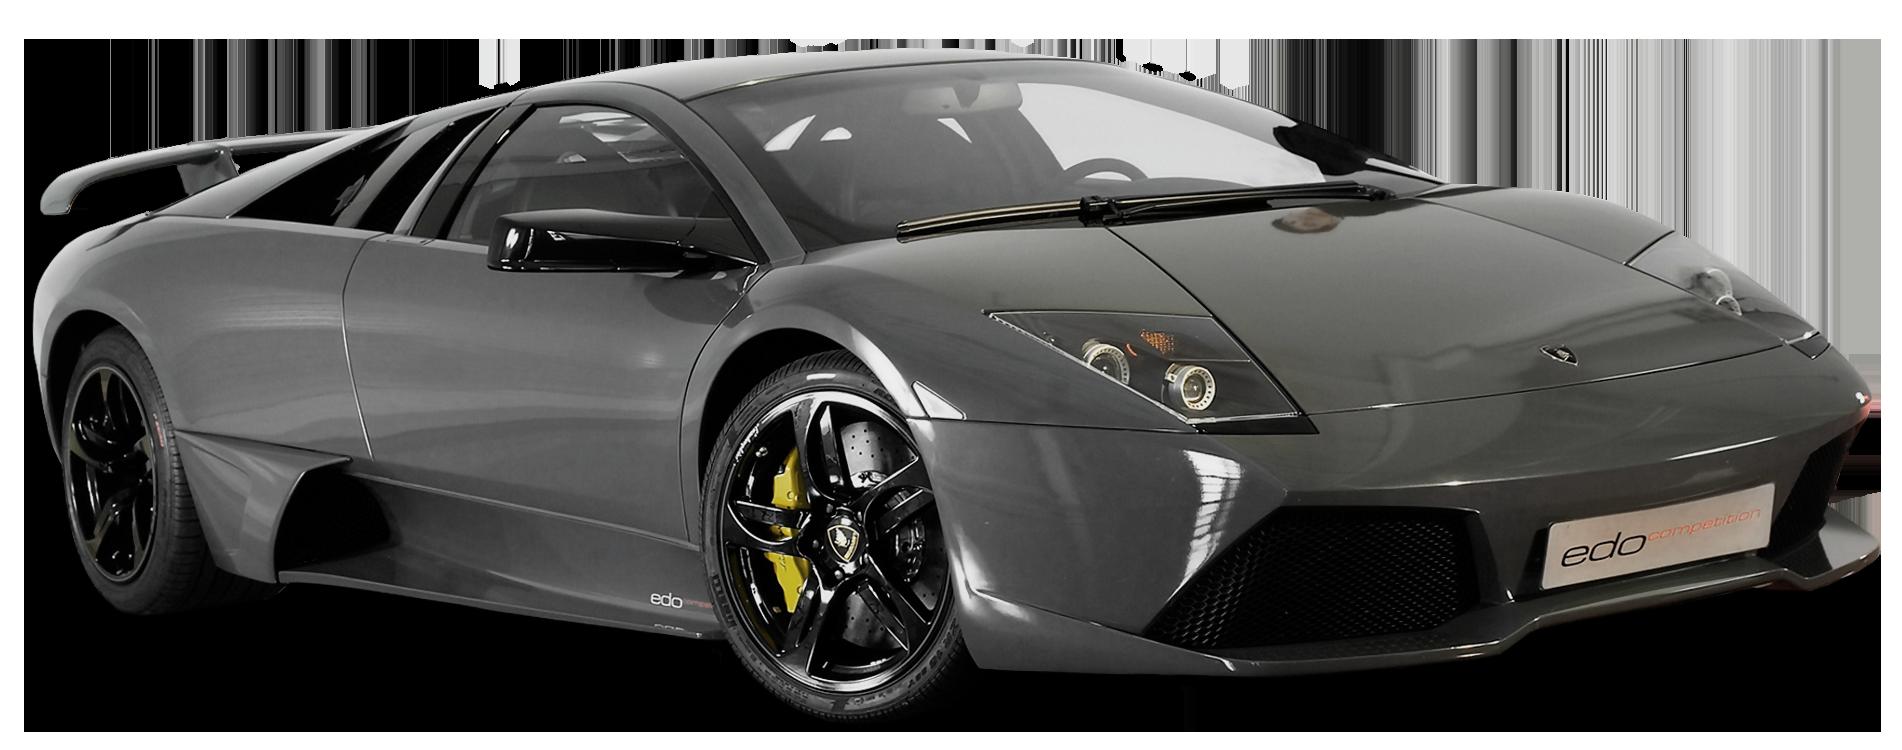 Grey car clipart graphic library stock Lamborghini Edo Competiton Car PNG Clipart - Best WEB Clipart graphic library stock